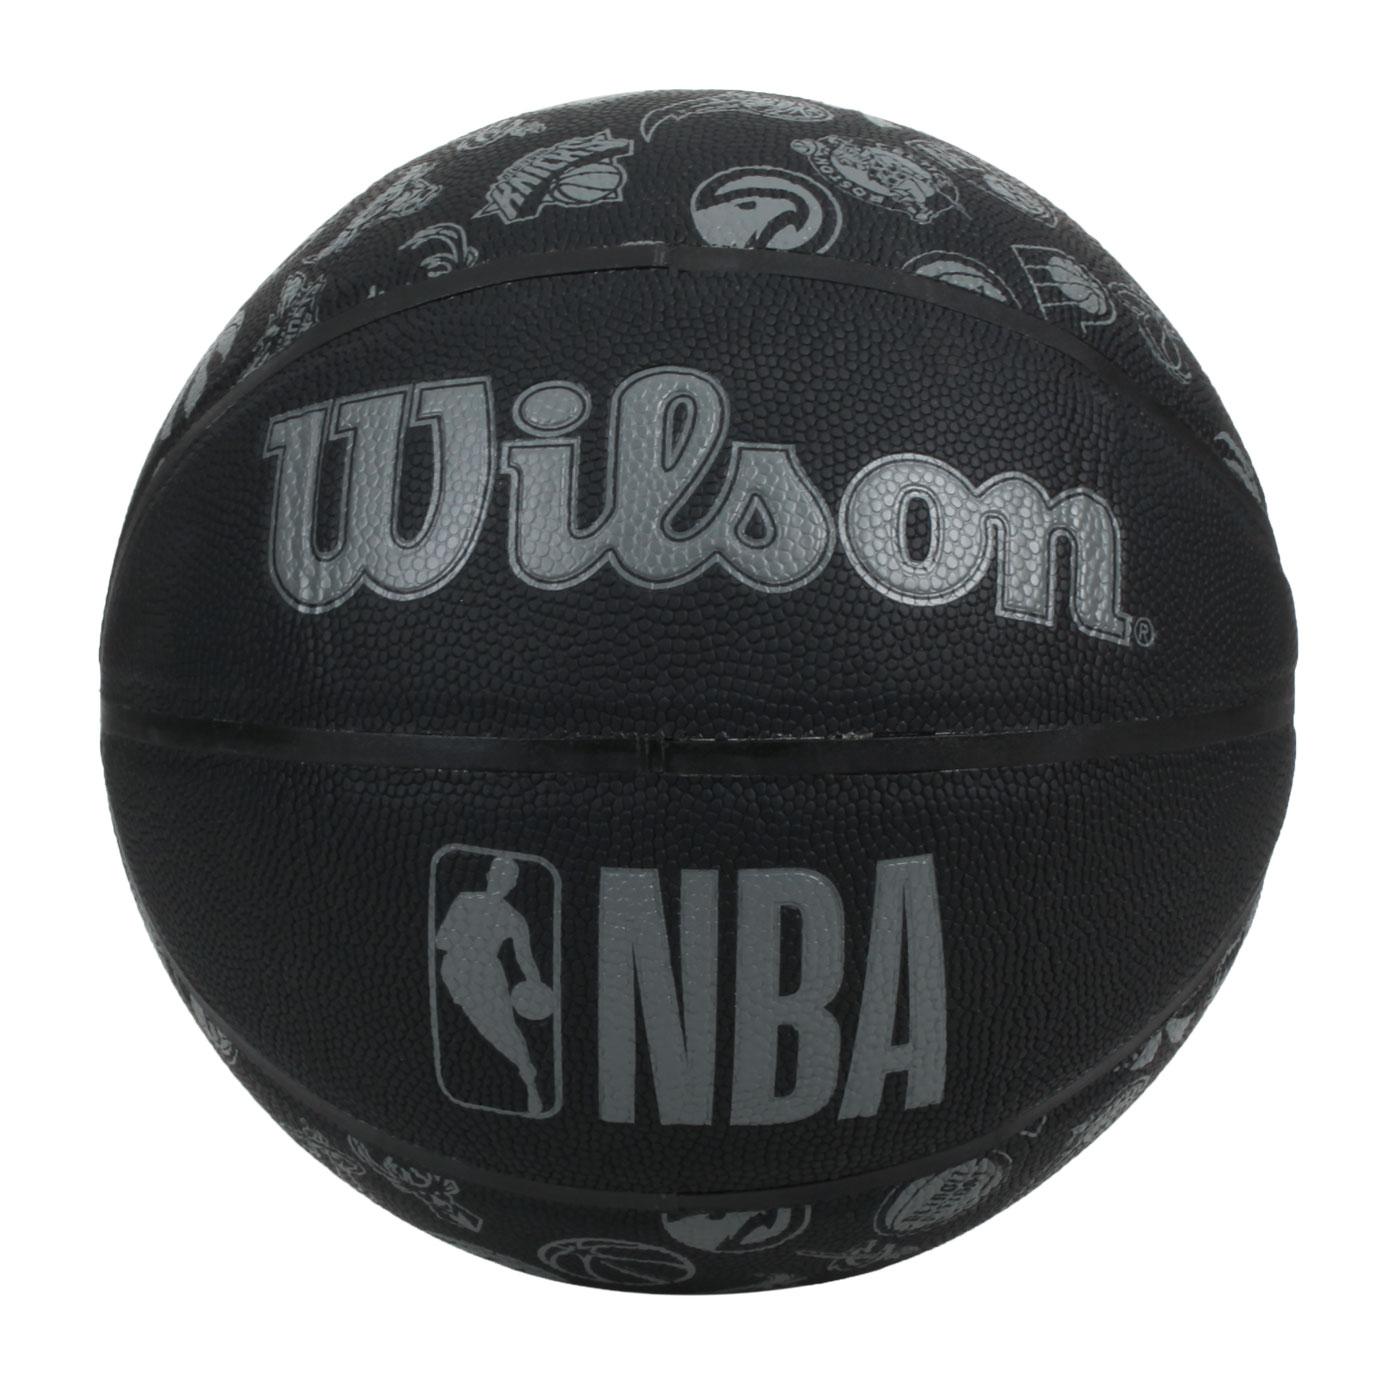 WILSON NBA ALL TEAM 隊徽合成皮籃球#7 WTB1300XBNBA - 黑灰